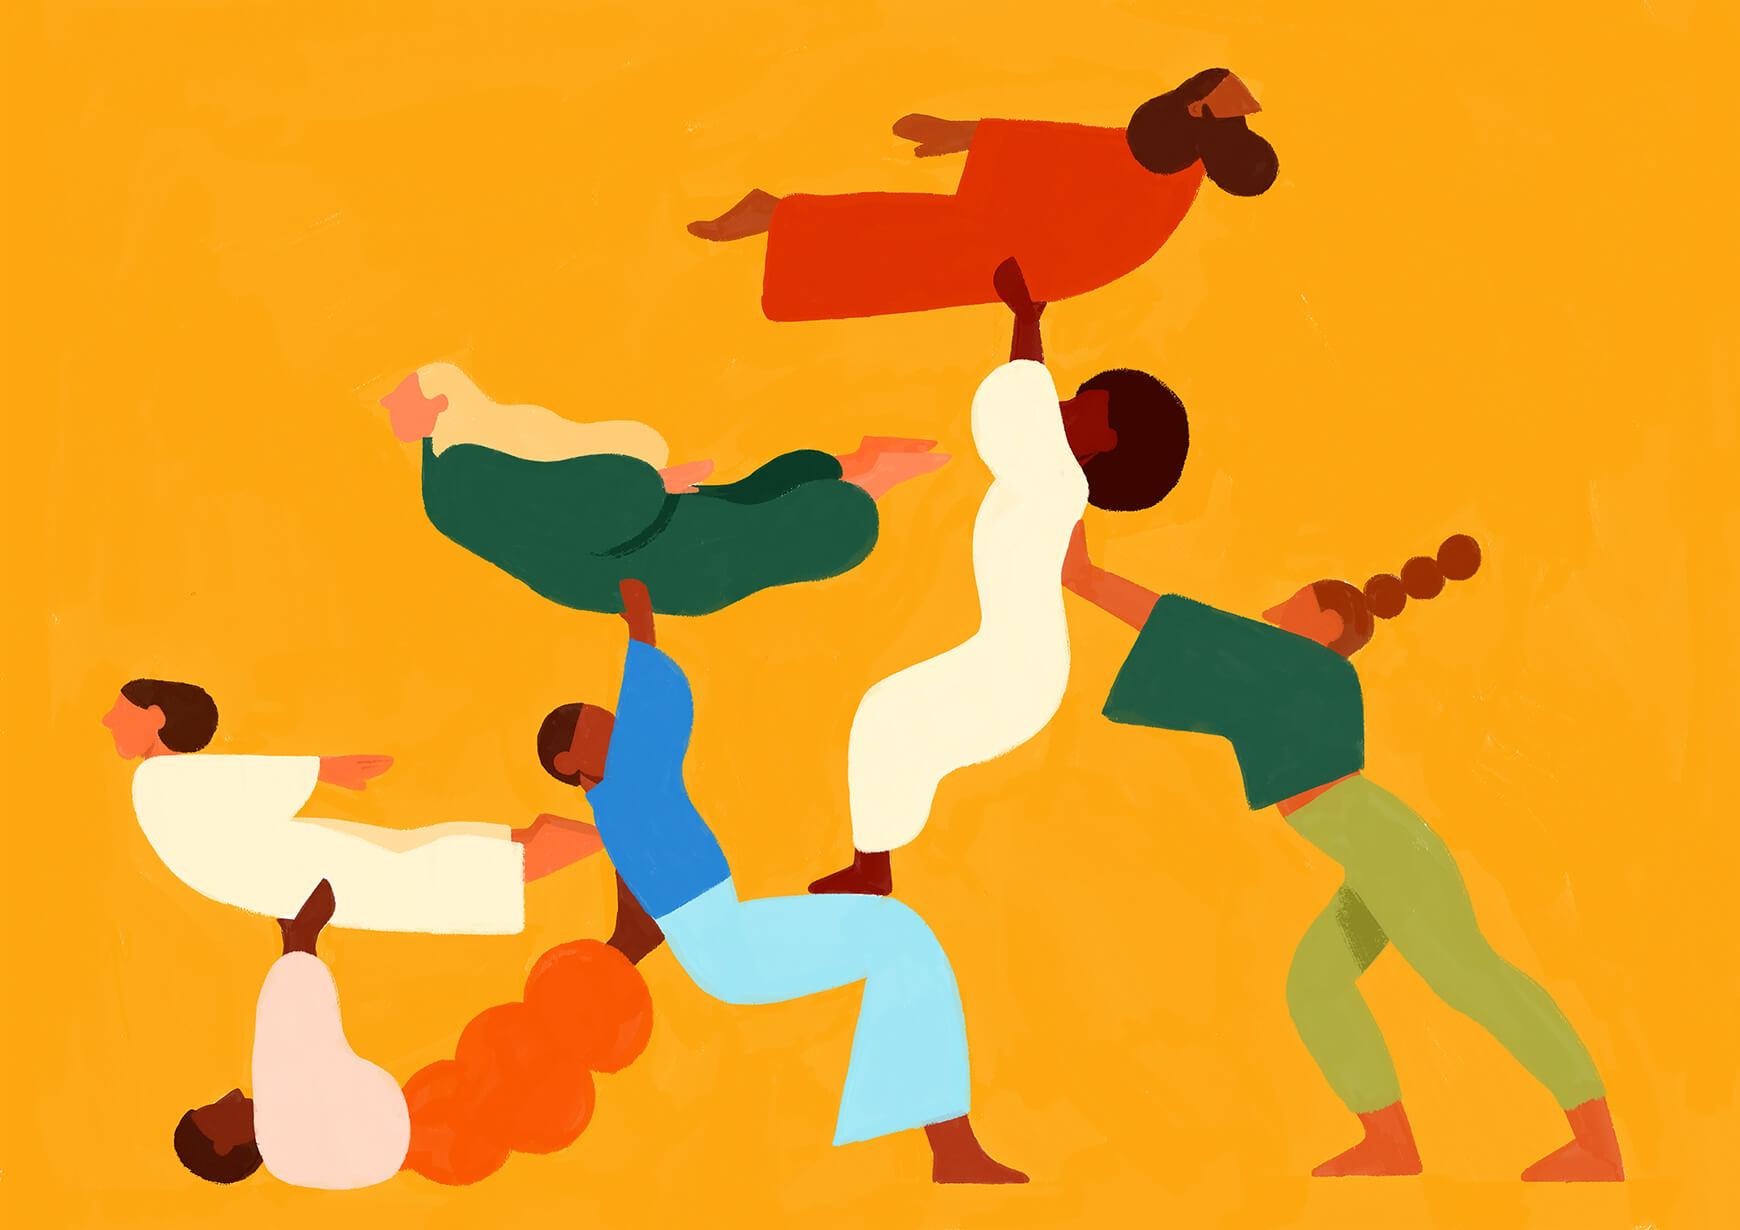 new-landscapes-community-strength-together-people-illustration-ilustracion-violeta-noy-thumbnail-1